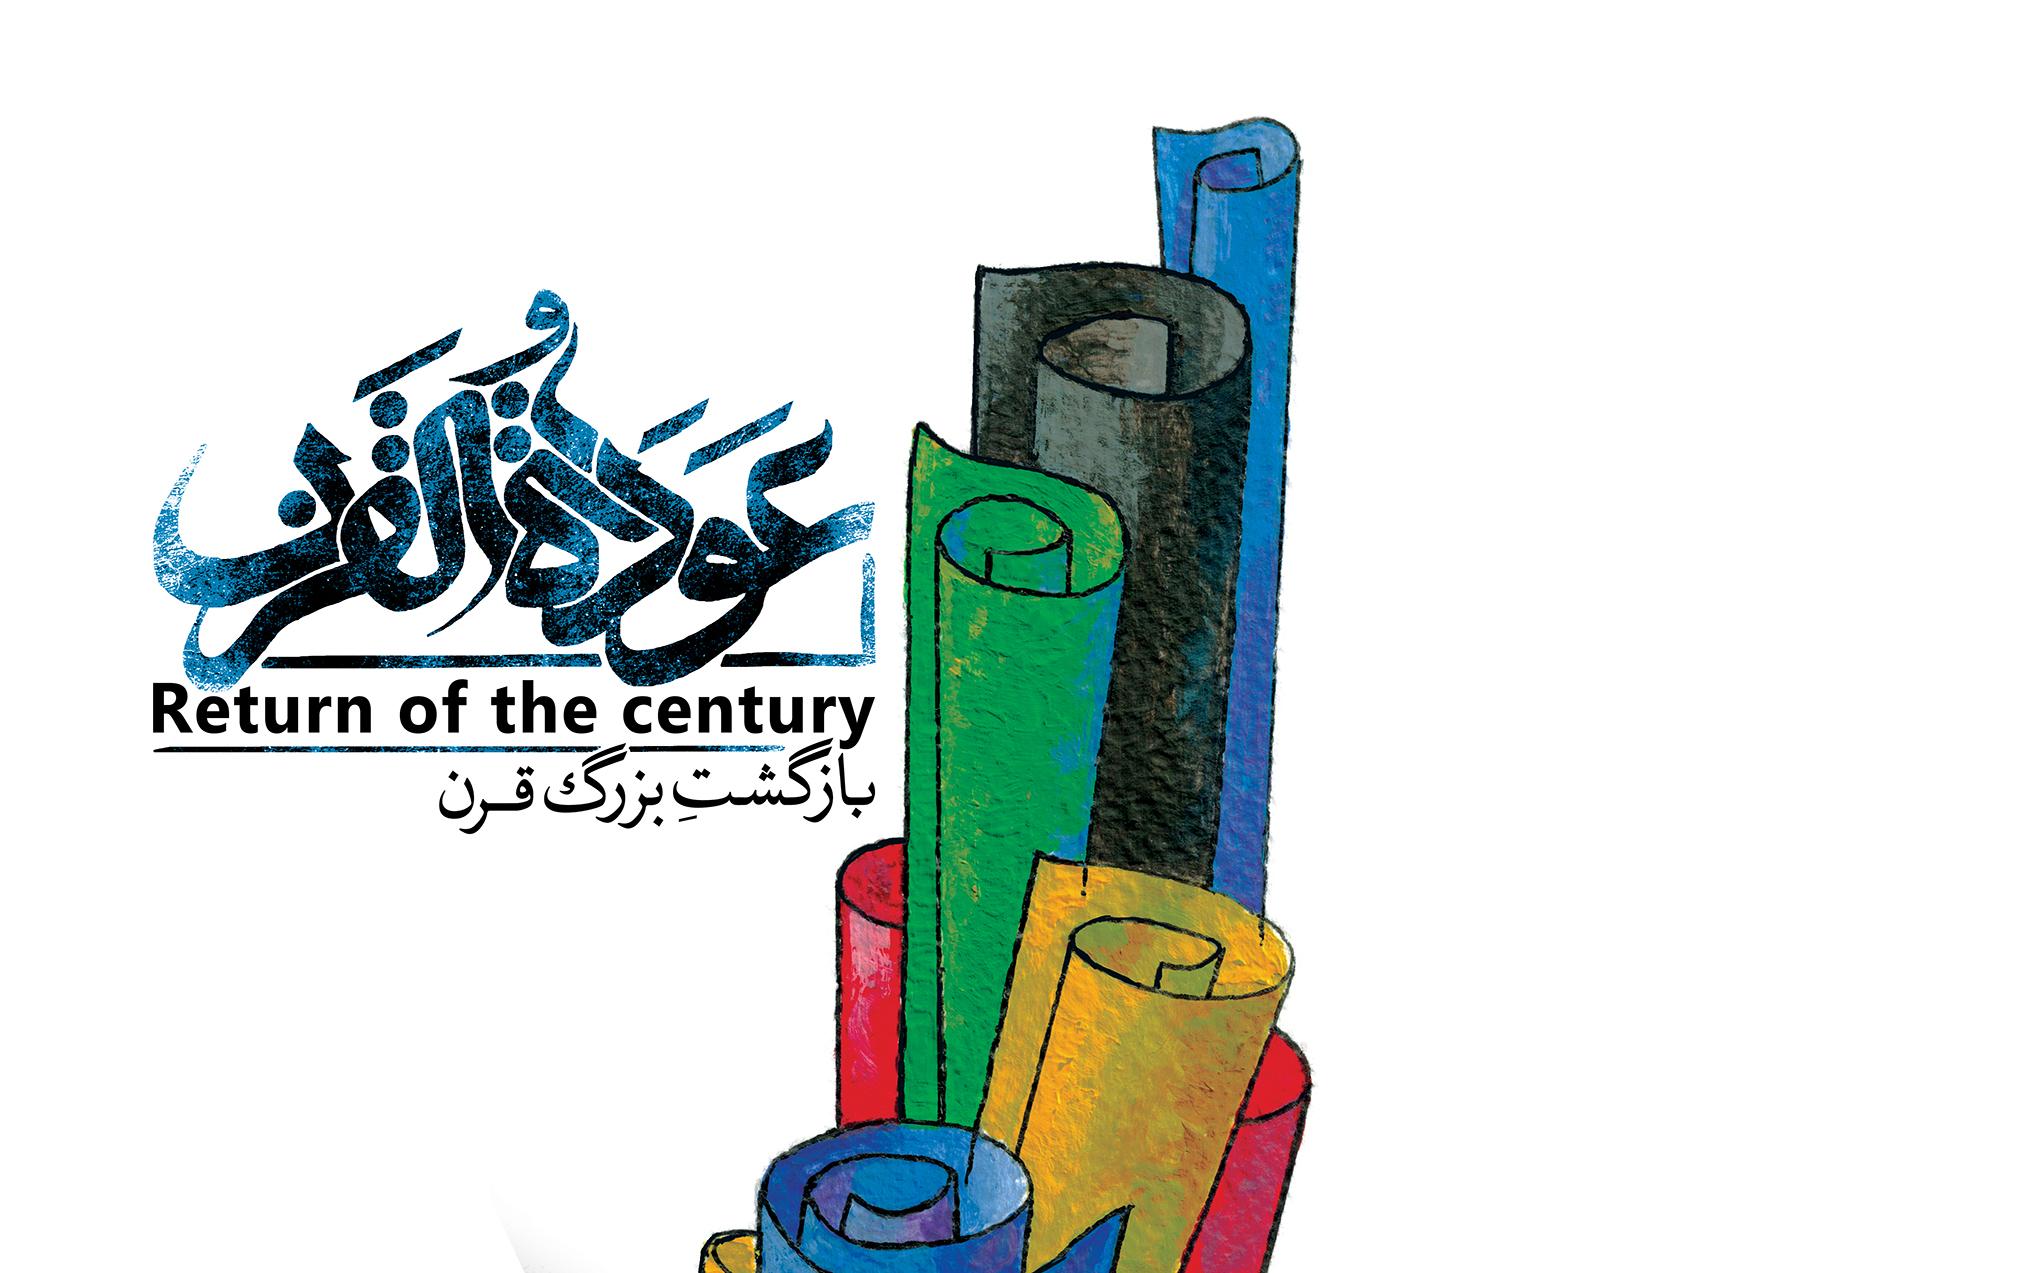 return of the century